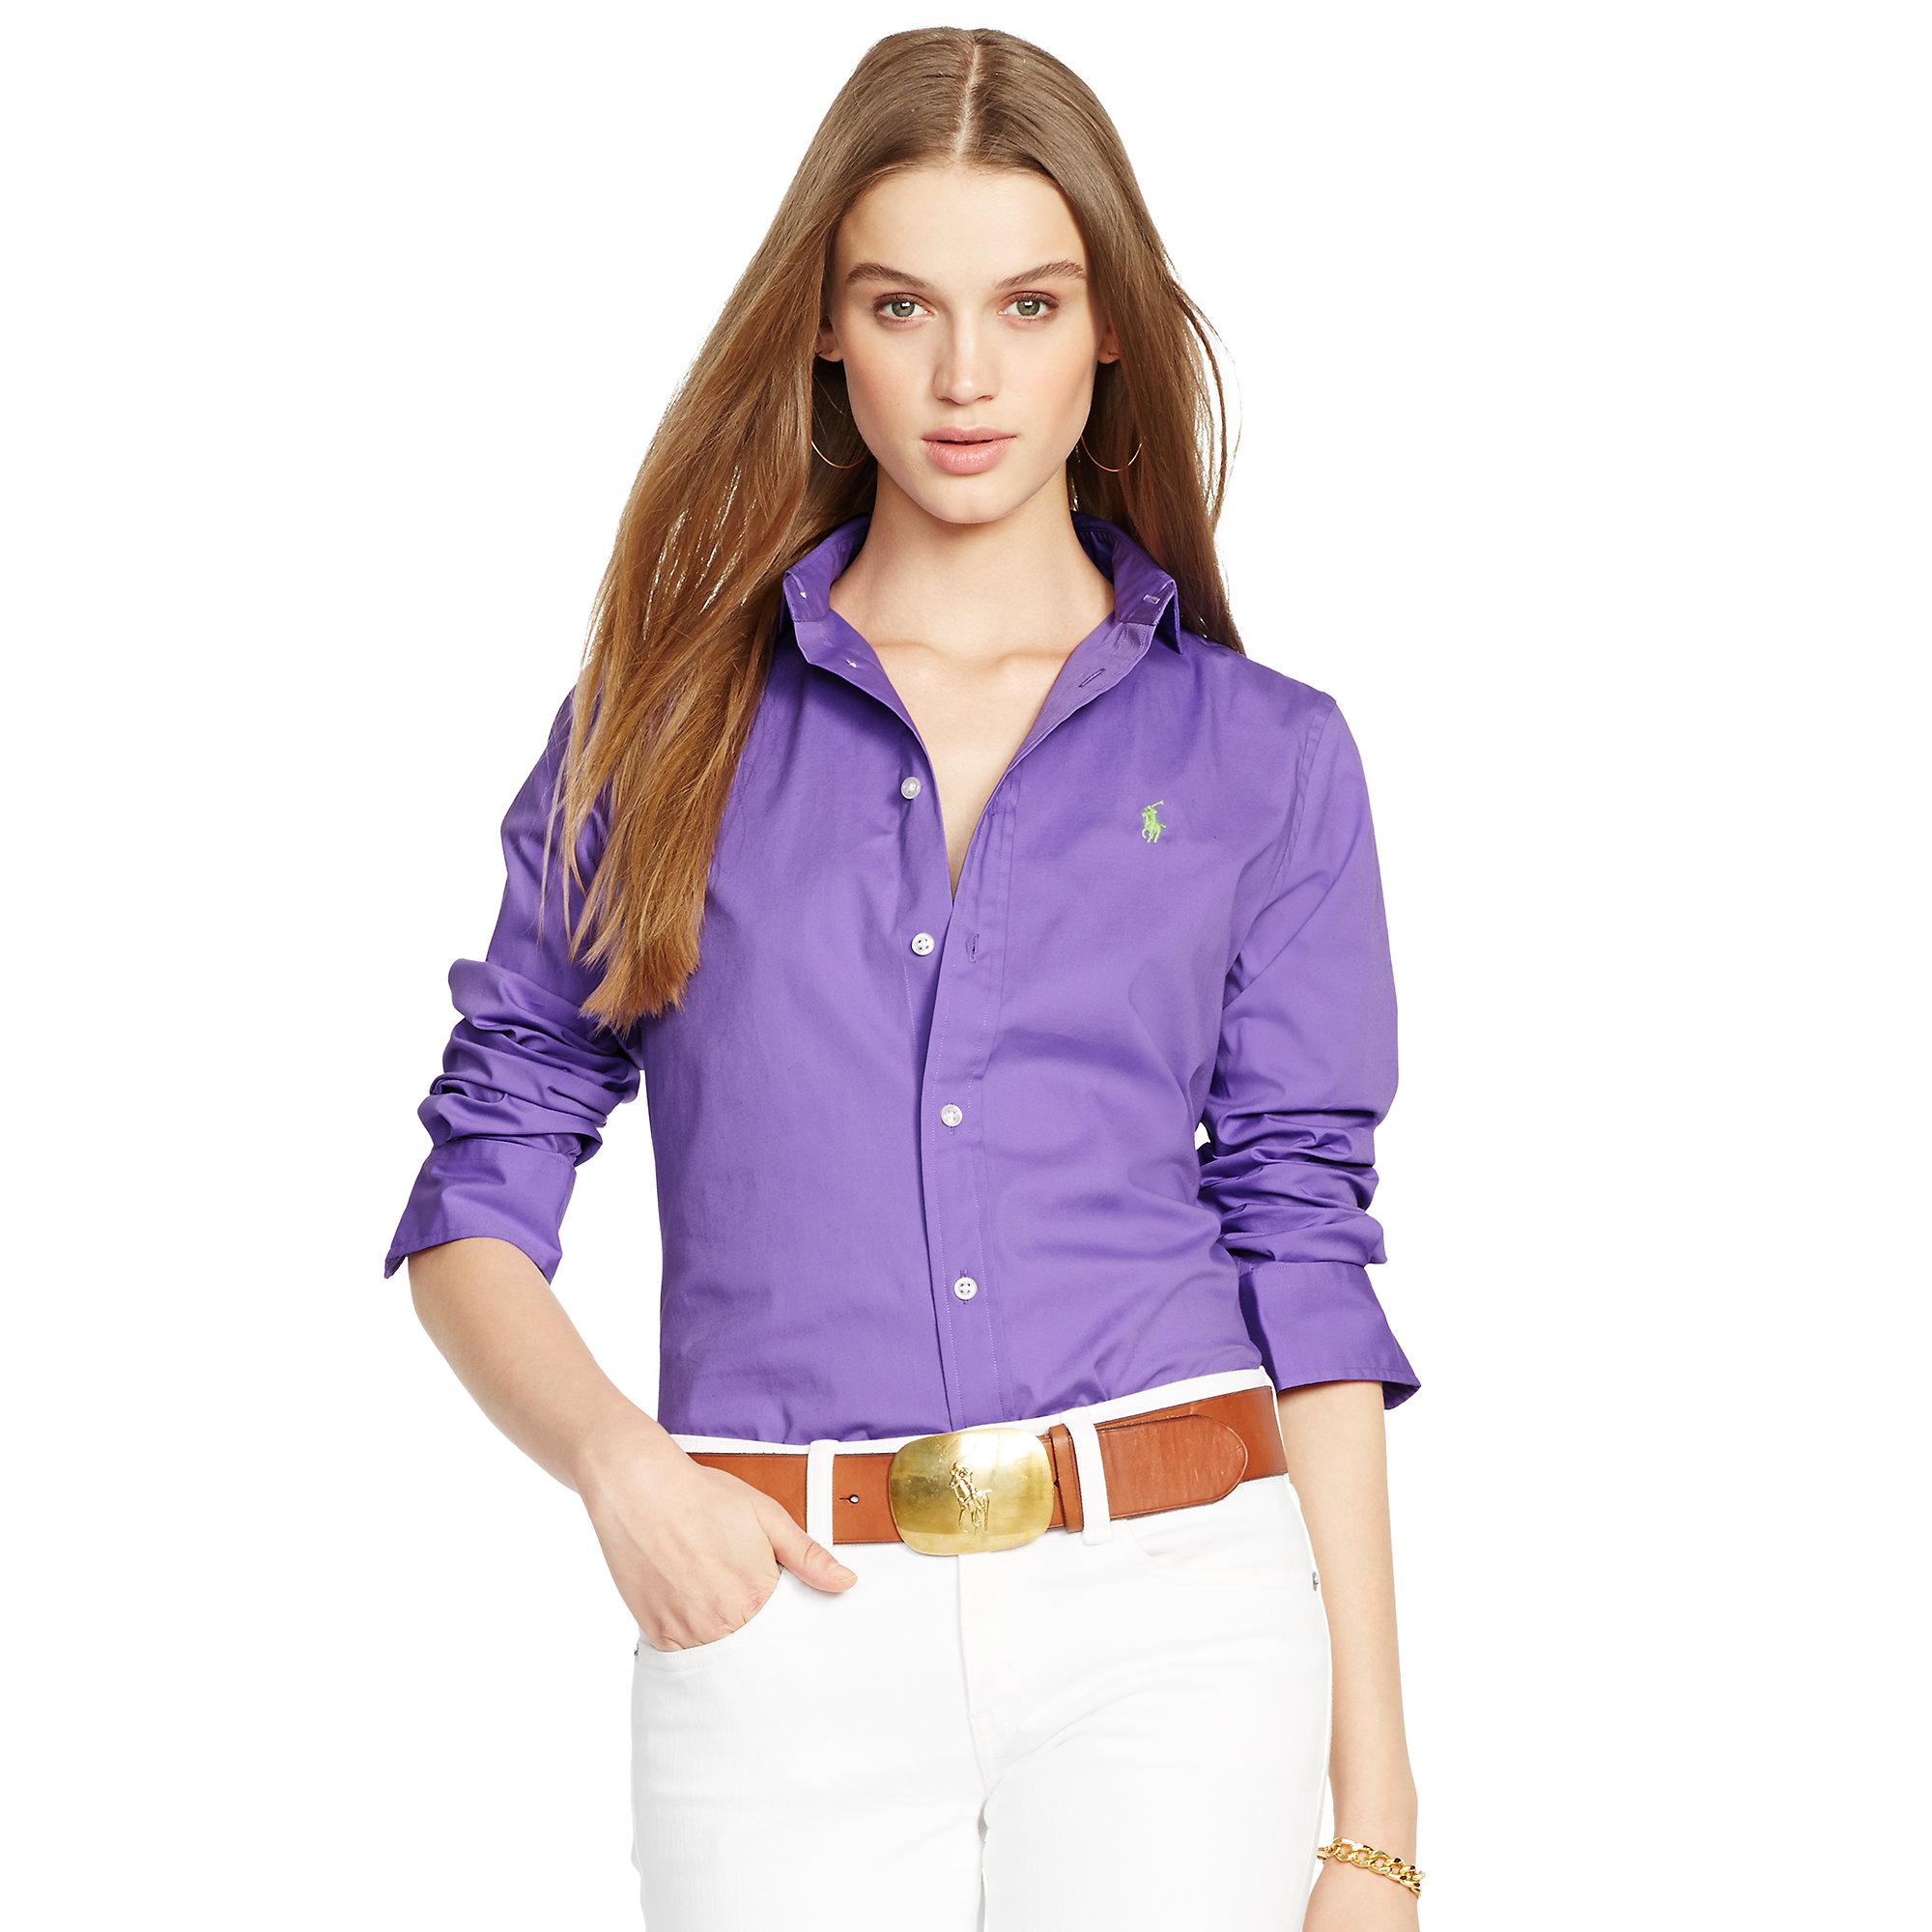 polo ralph lauren long sleeve polo shirt in custom fit ...